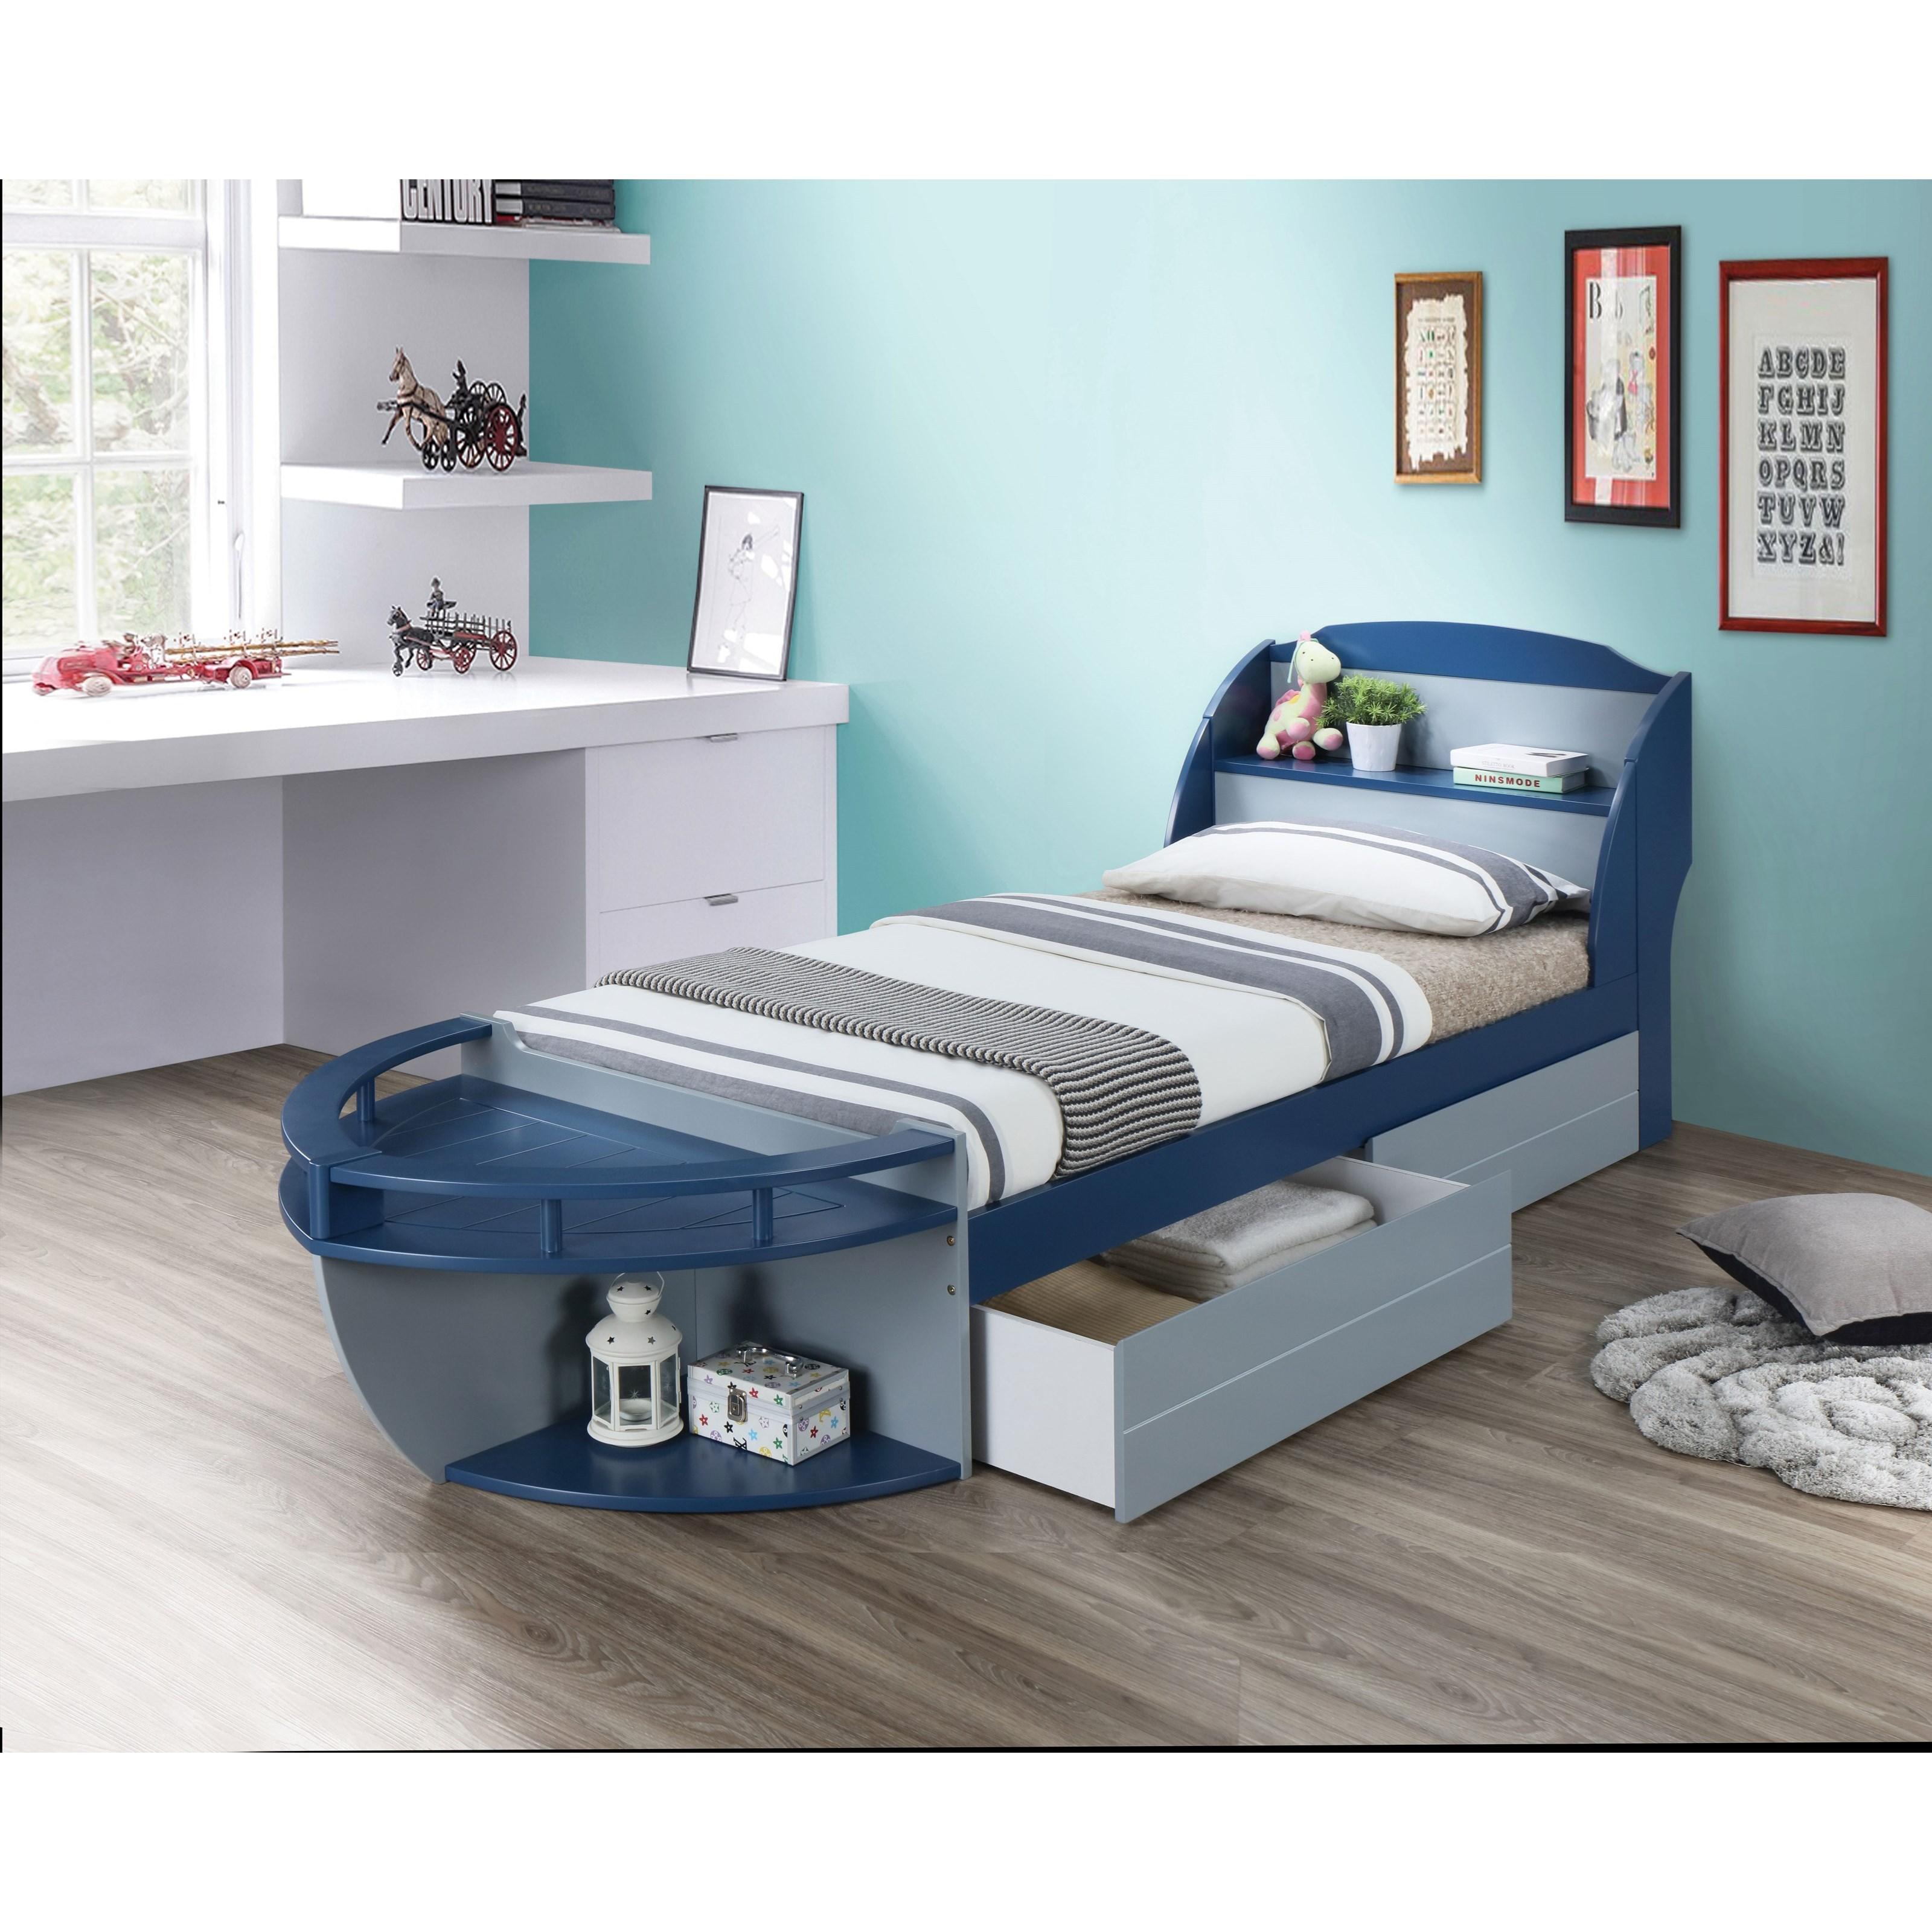 Acme Furniture Neptune Ii 30620t Twin Ship Bed With Headboard Shelf Storage Corner Furniture Platform Beds Low Profile Beds